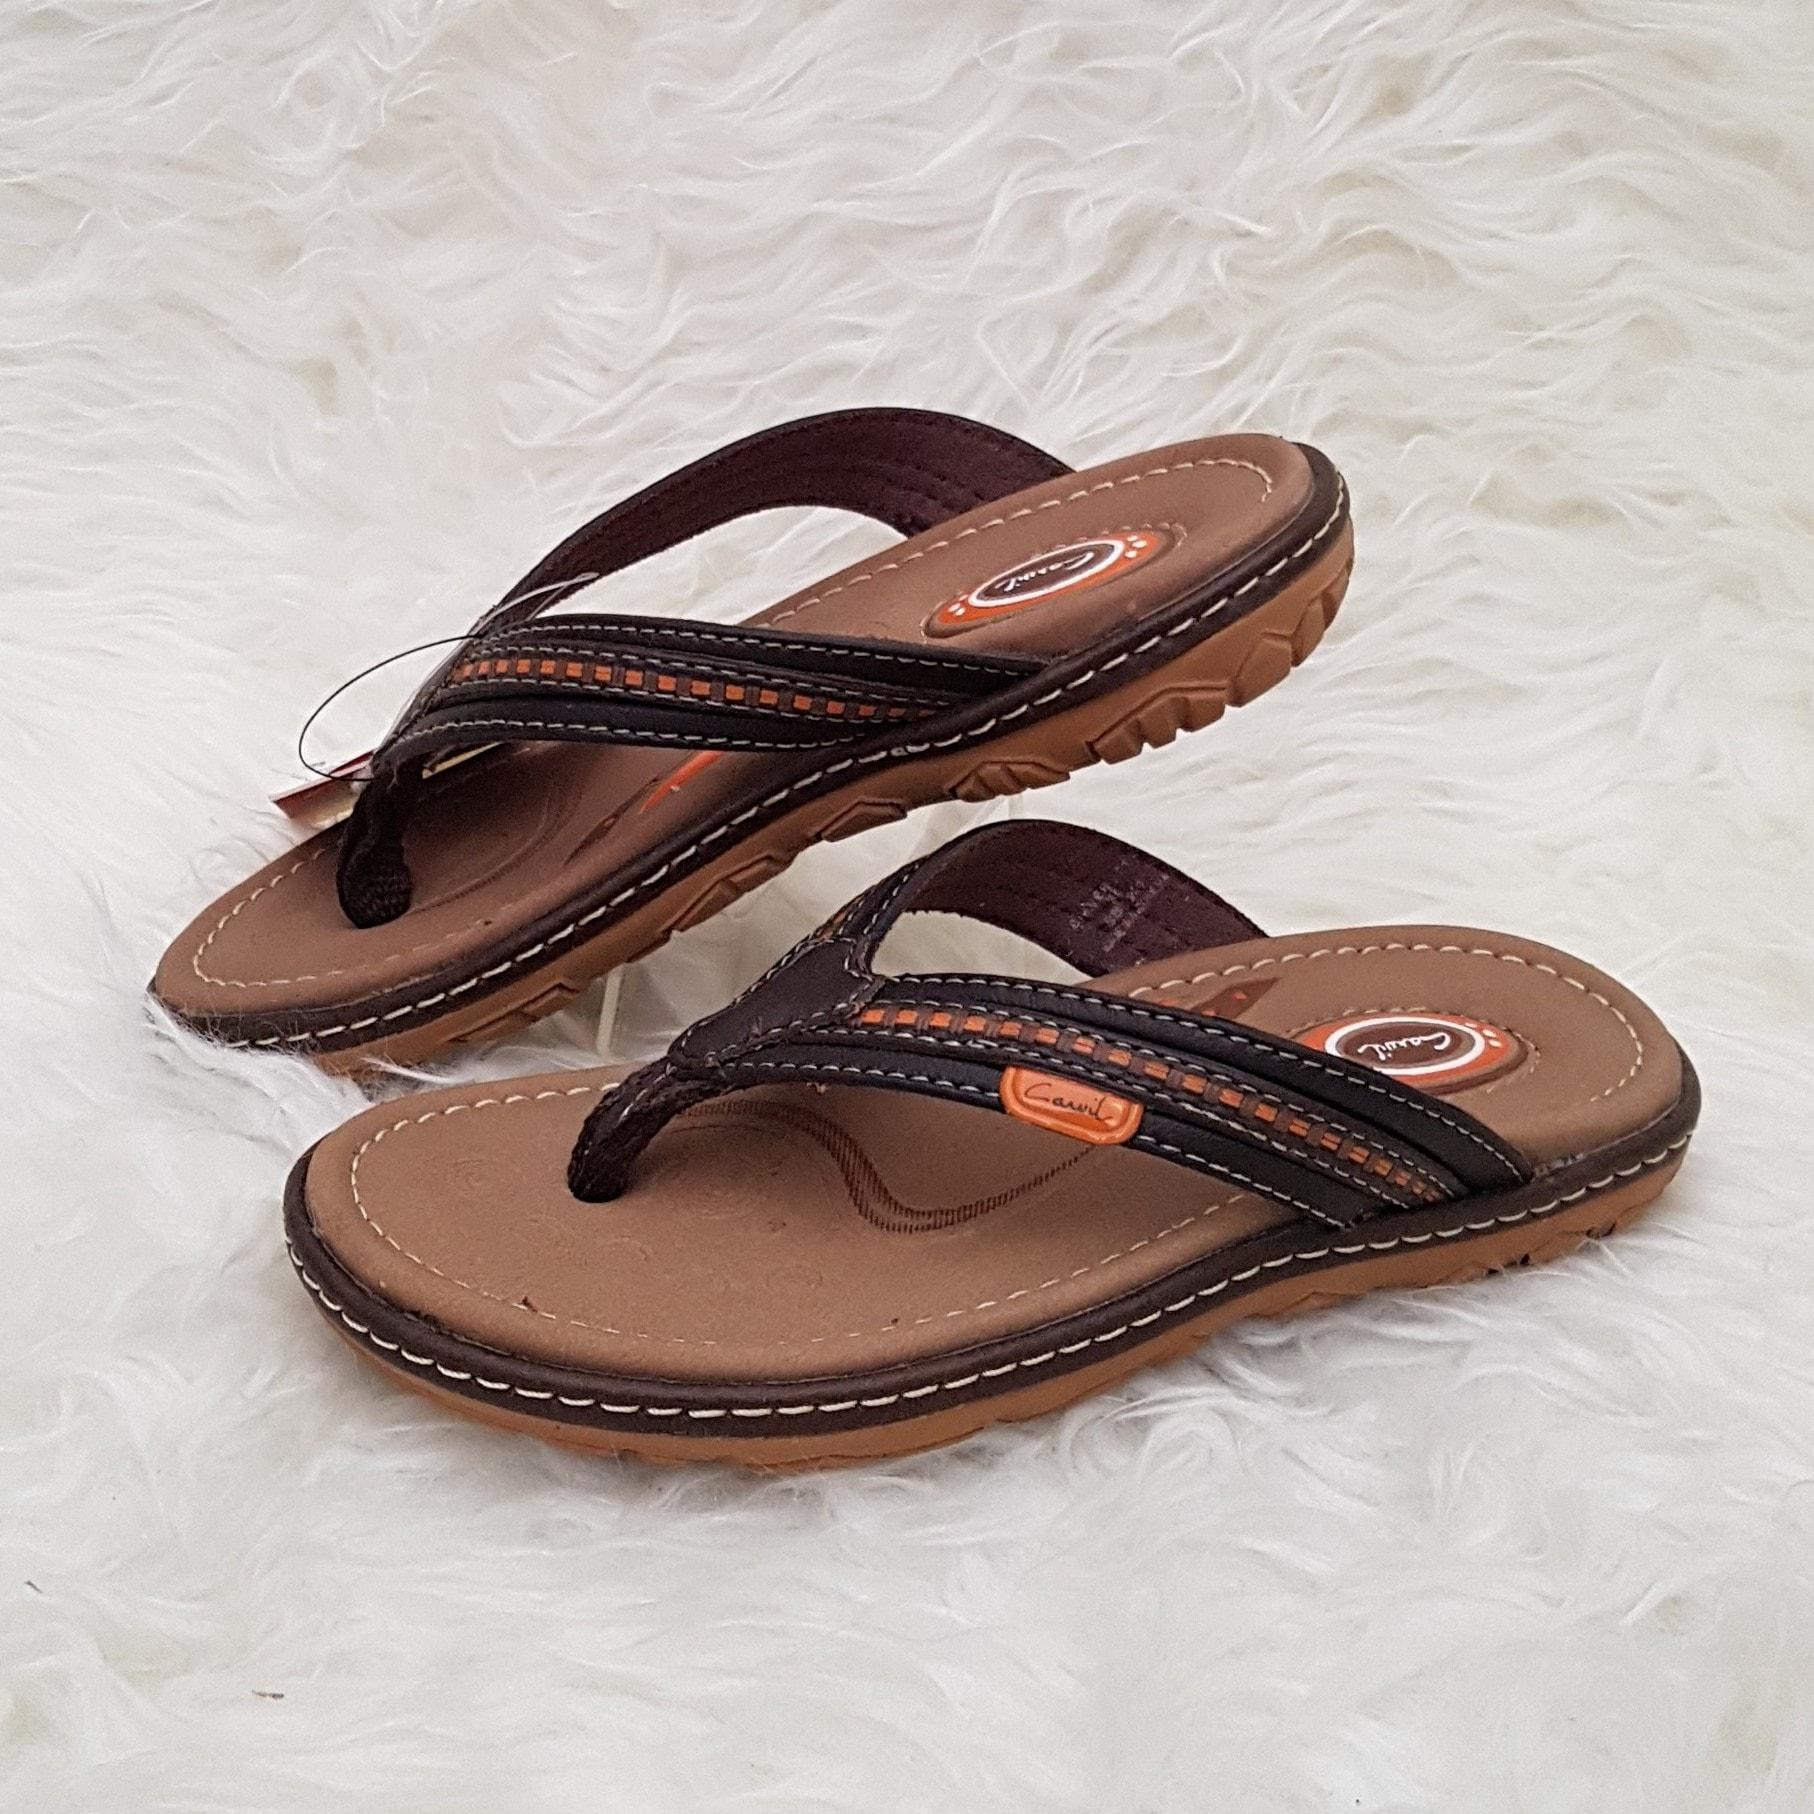 Jual Carvil Balver 71 C Dark Brown Coklat Tua Sandal Fashion Anak Laki Laki Adi Jaya Perkasa